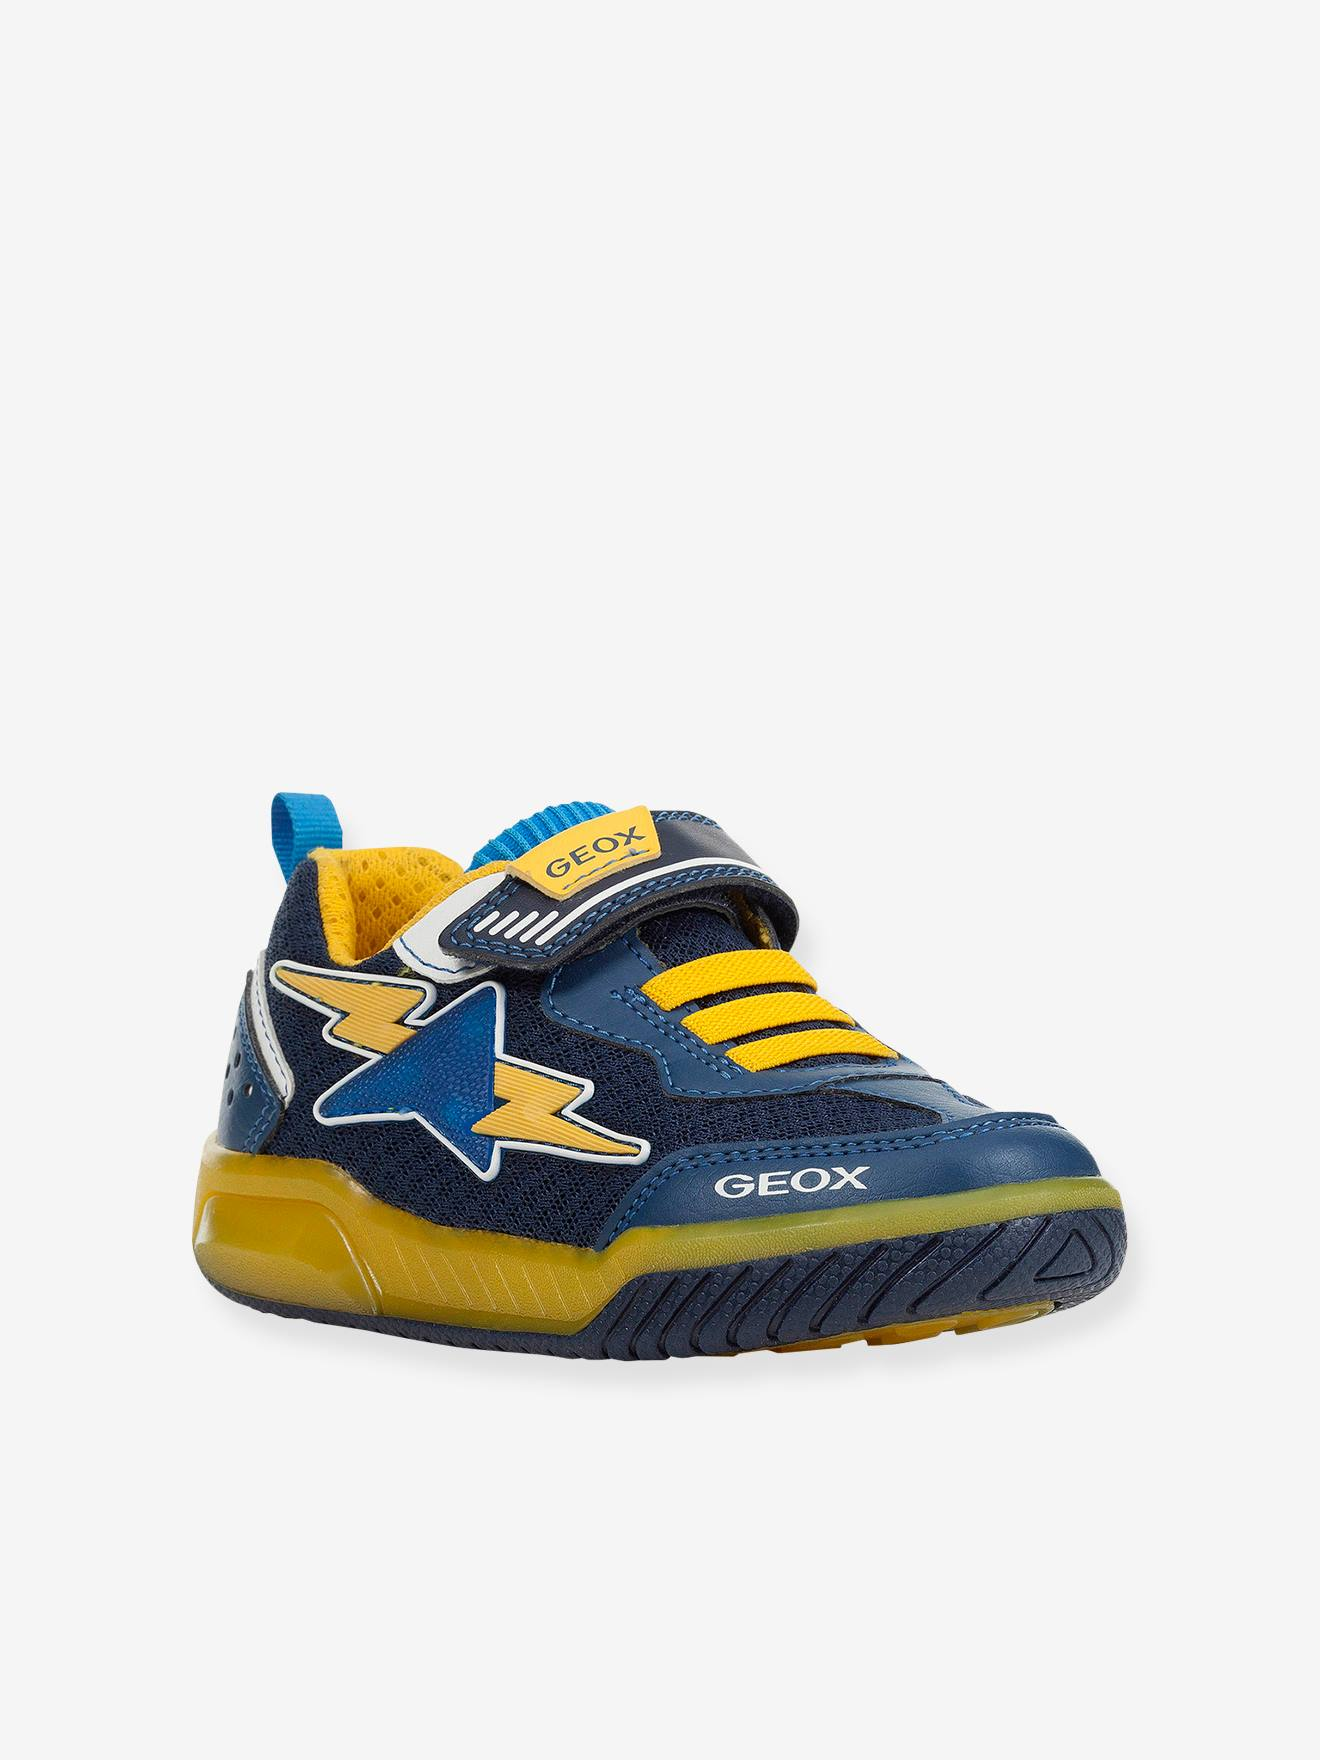 "Geox Jungen Sneakers ""Inek"" GEOX in marine"